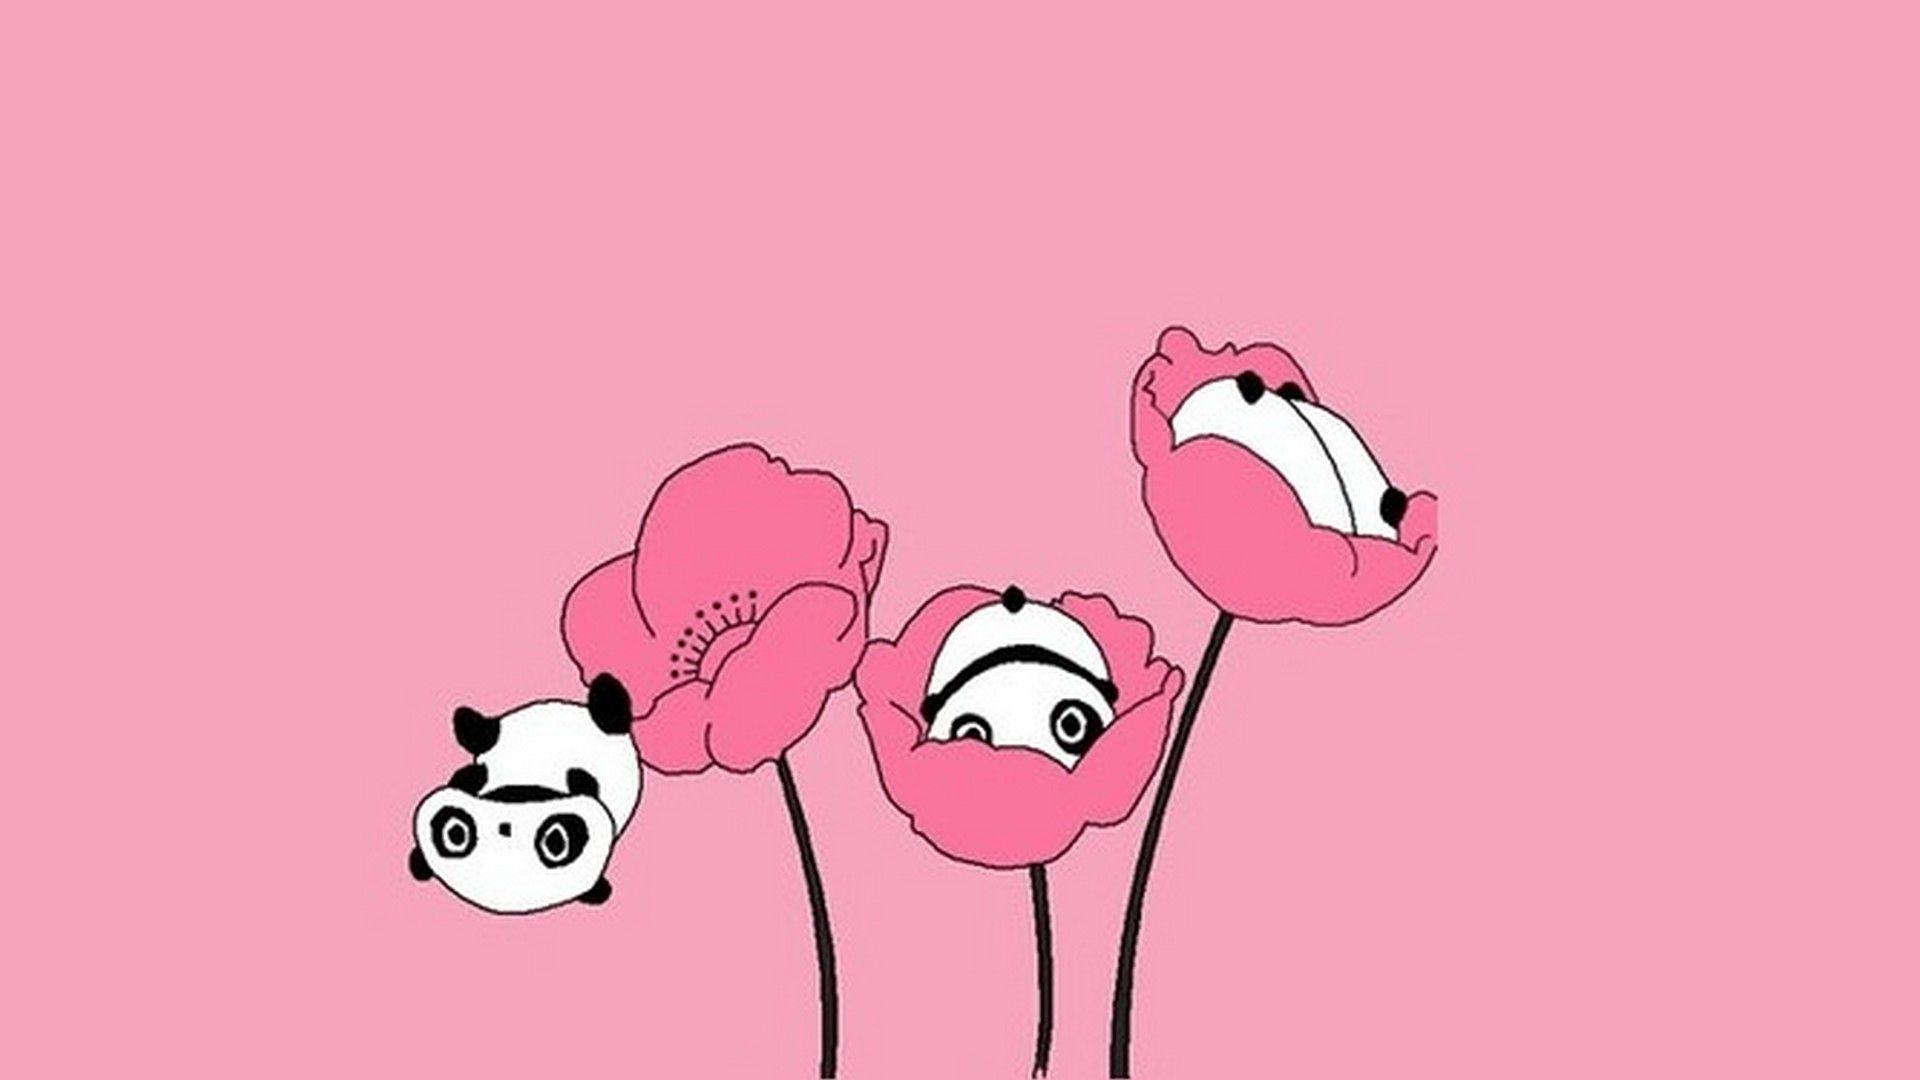 Cute Pink Panda Wallpaper Panda wallpapers, Cute girl